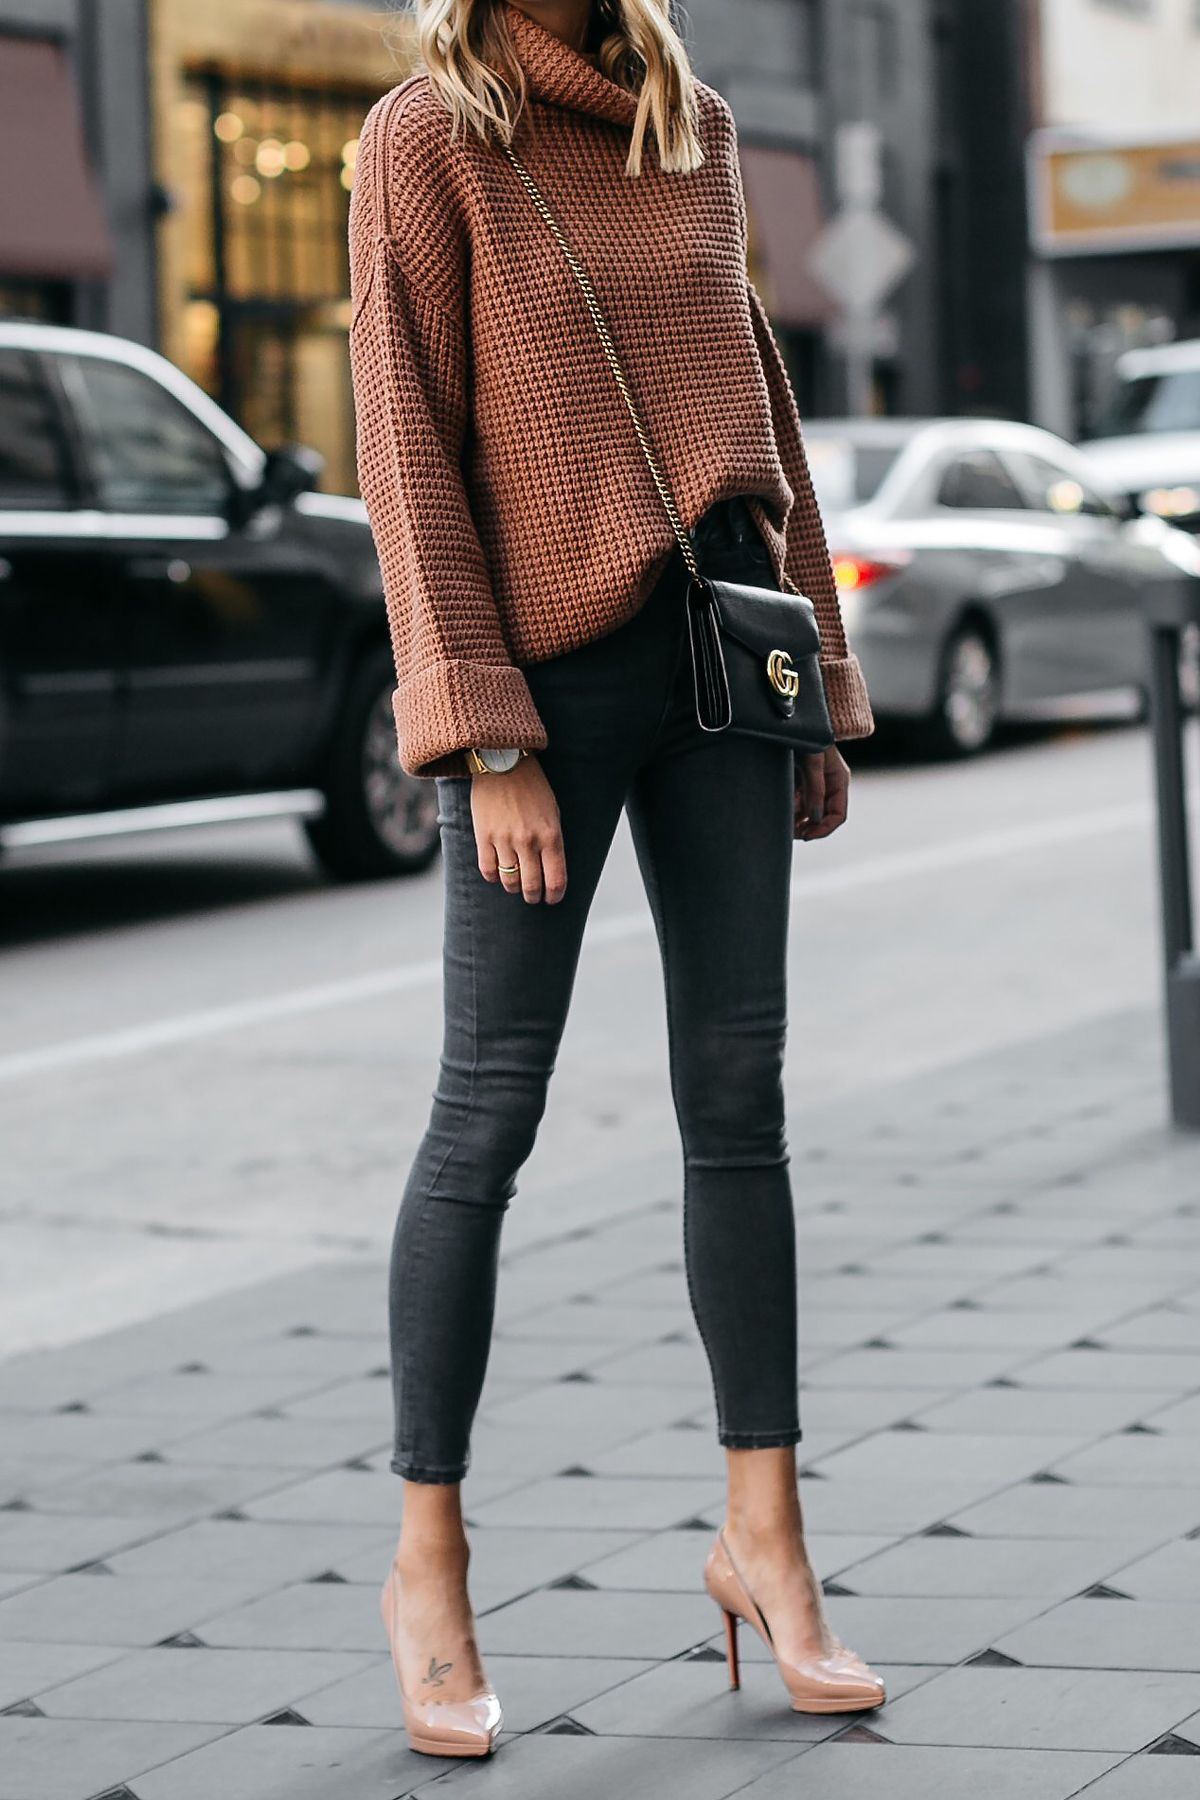 1c55c3e6f4c Fashion Jackson Oversized Sweater Free People Park City Pullover Tan Sweater  Grey Skinny Jeans Nude Pumps Gucci Marmont Handbag